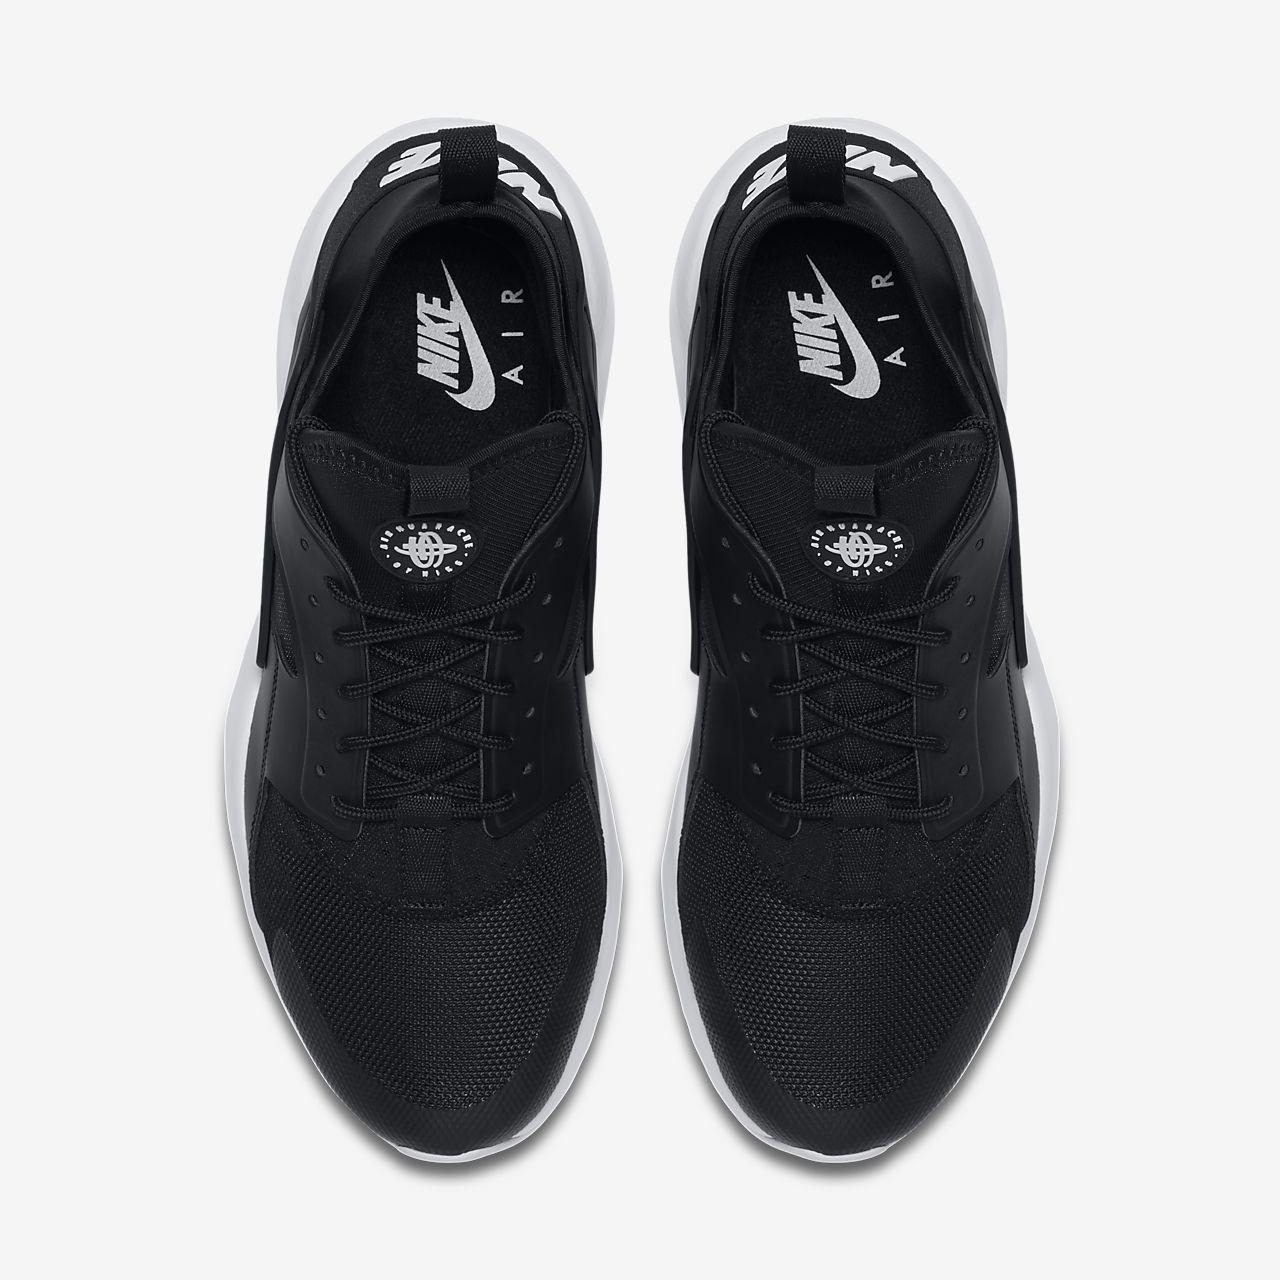 874441c79f302 huarache pour homme,Running X LV Supreme Nike air Huarache Ultra Red Chaussures  Urh X Supreme ...